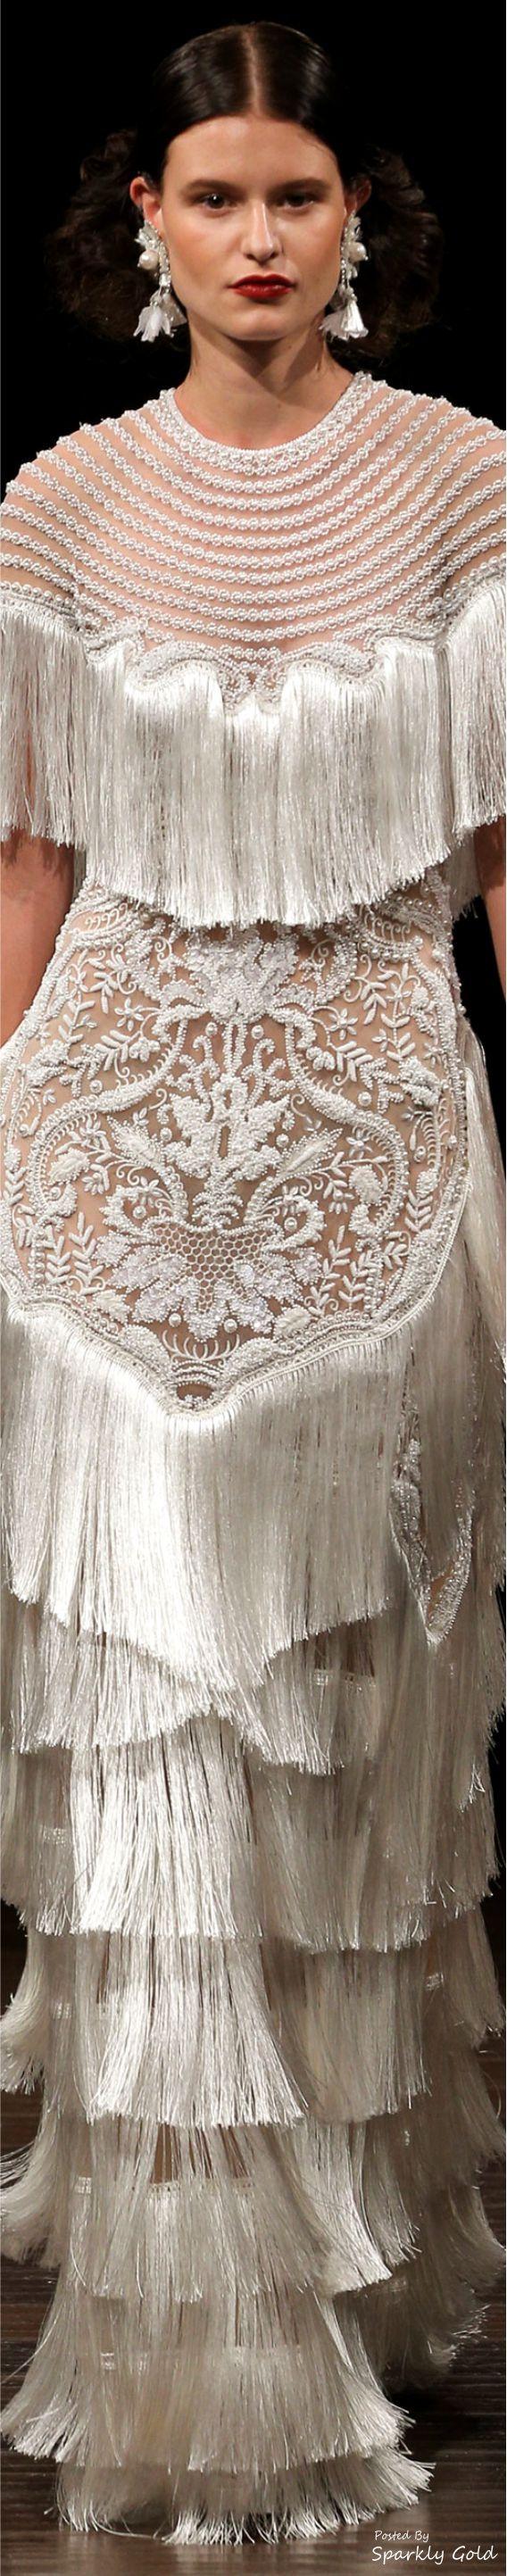 www.2locos.com  Naeem Khan Bridal Fall 2017